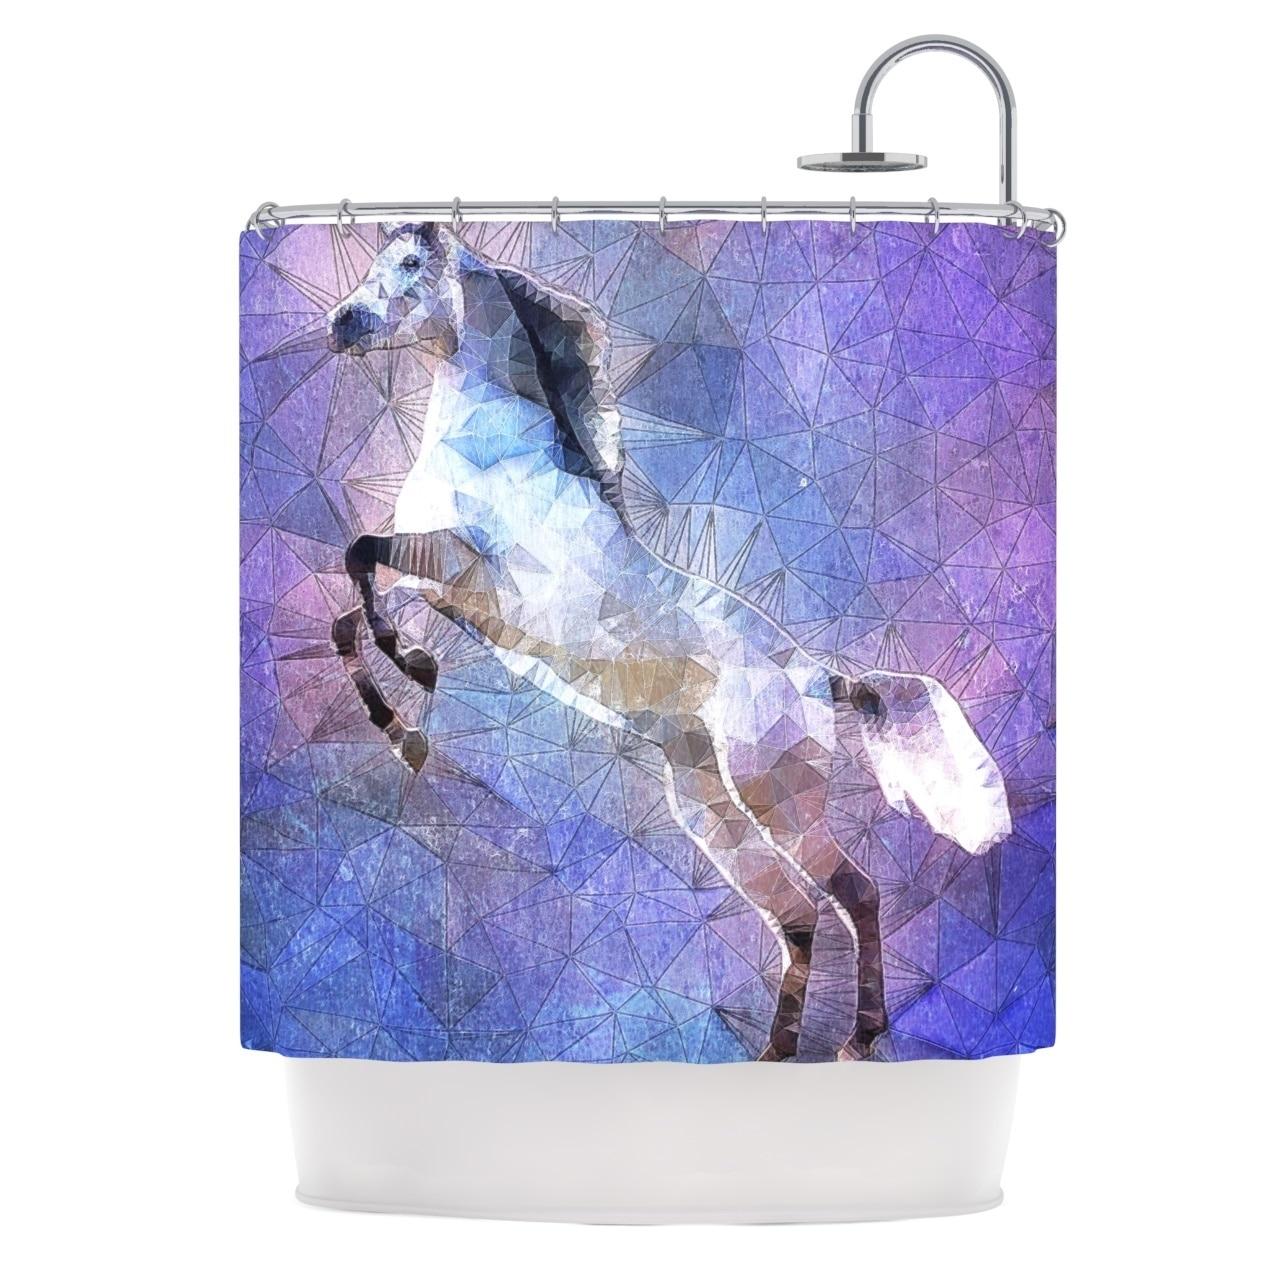 Kess InHouse Ancello Abstract Horse Purple Blue Shower Cu...